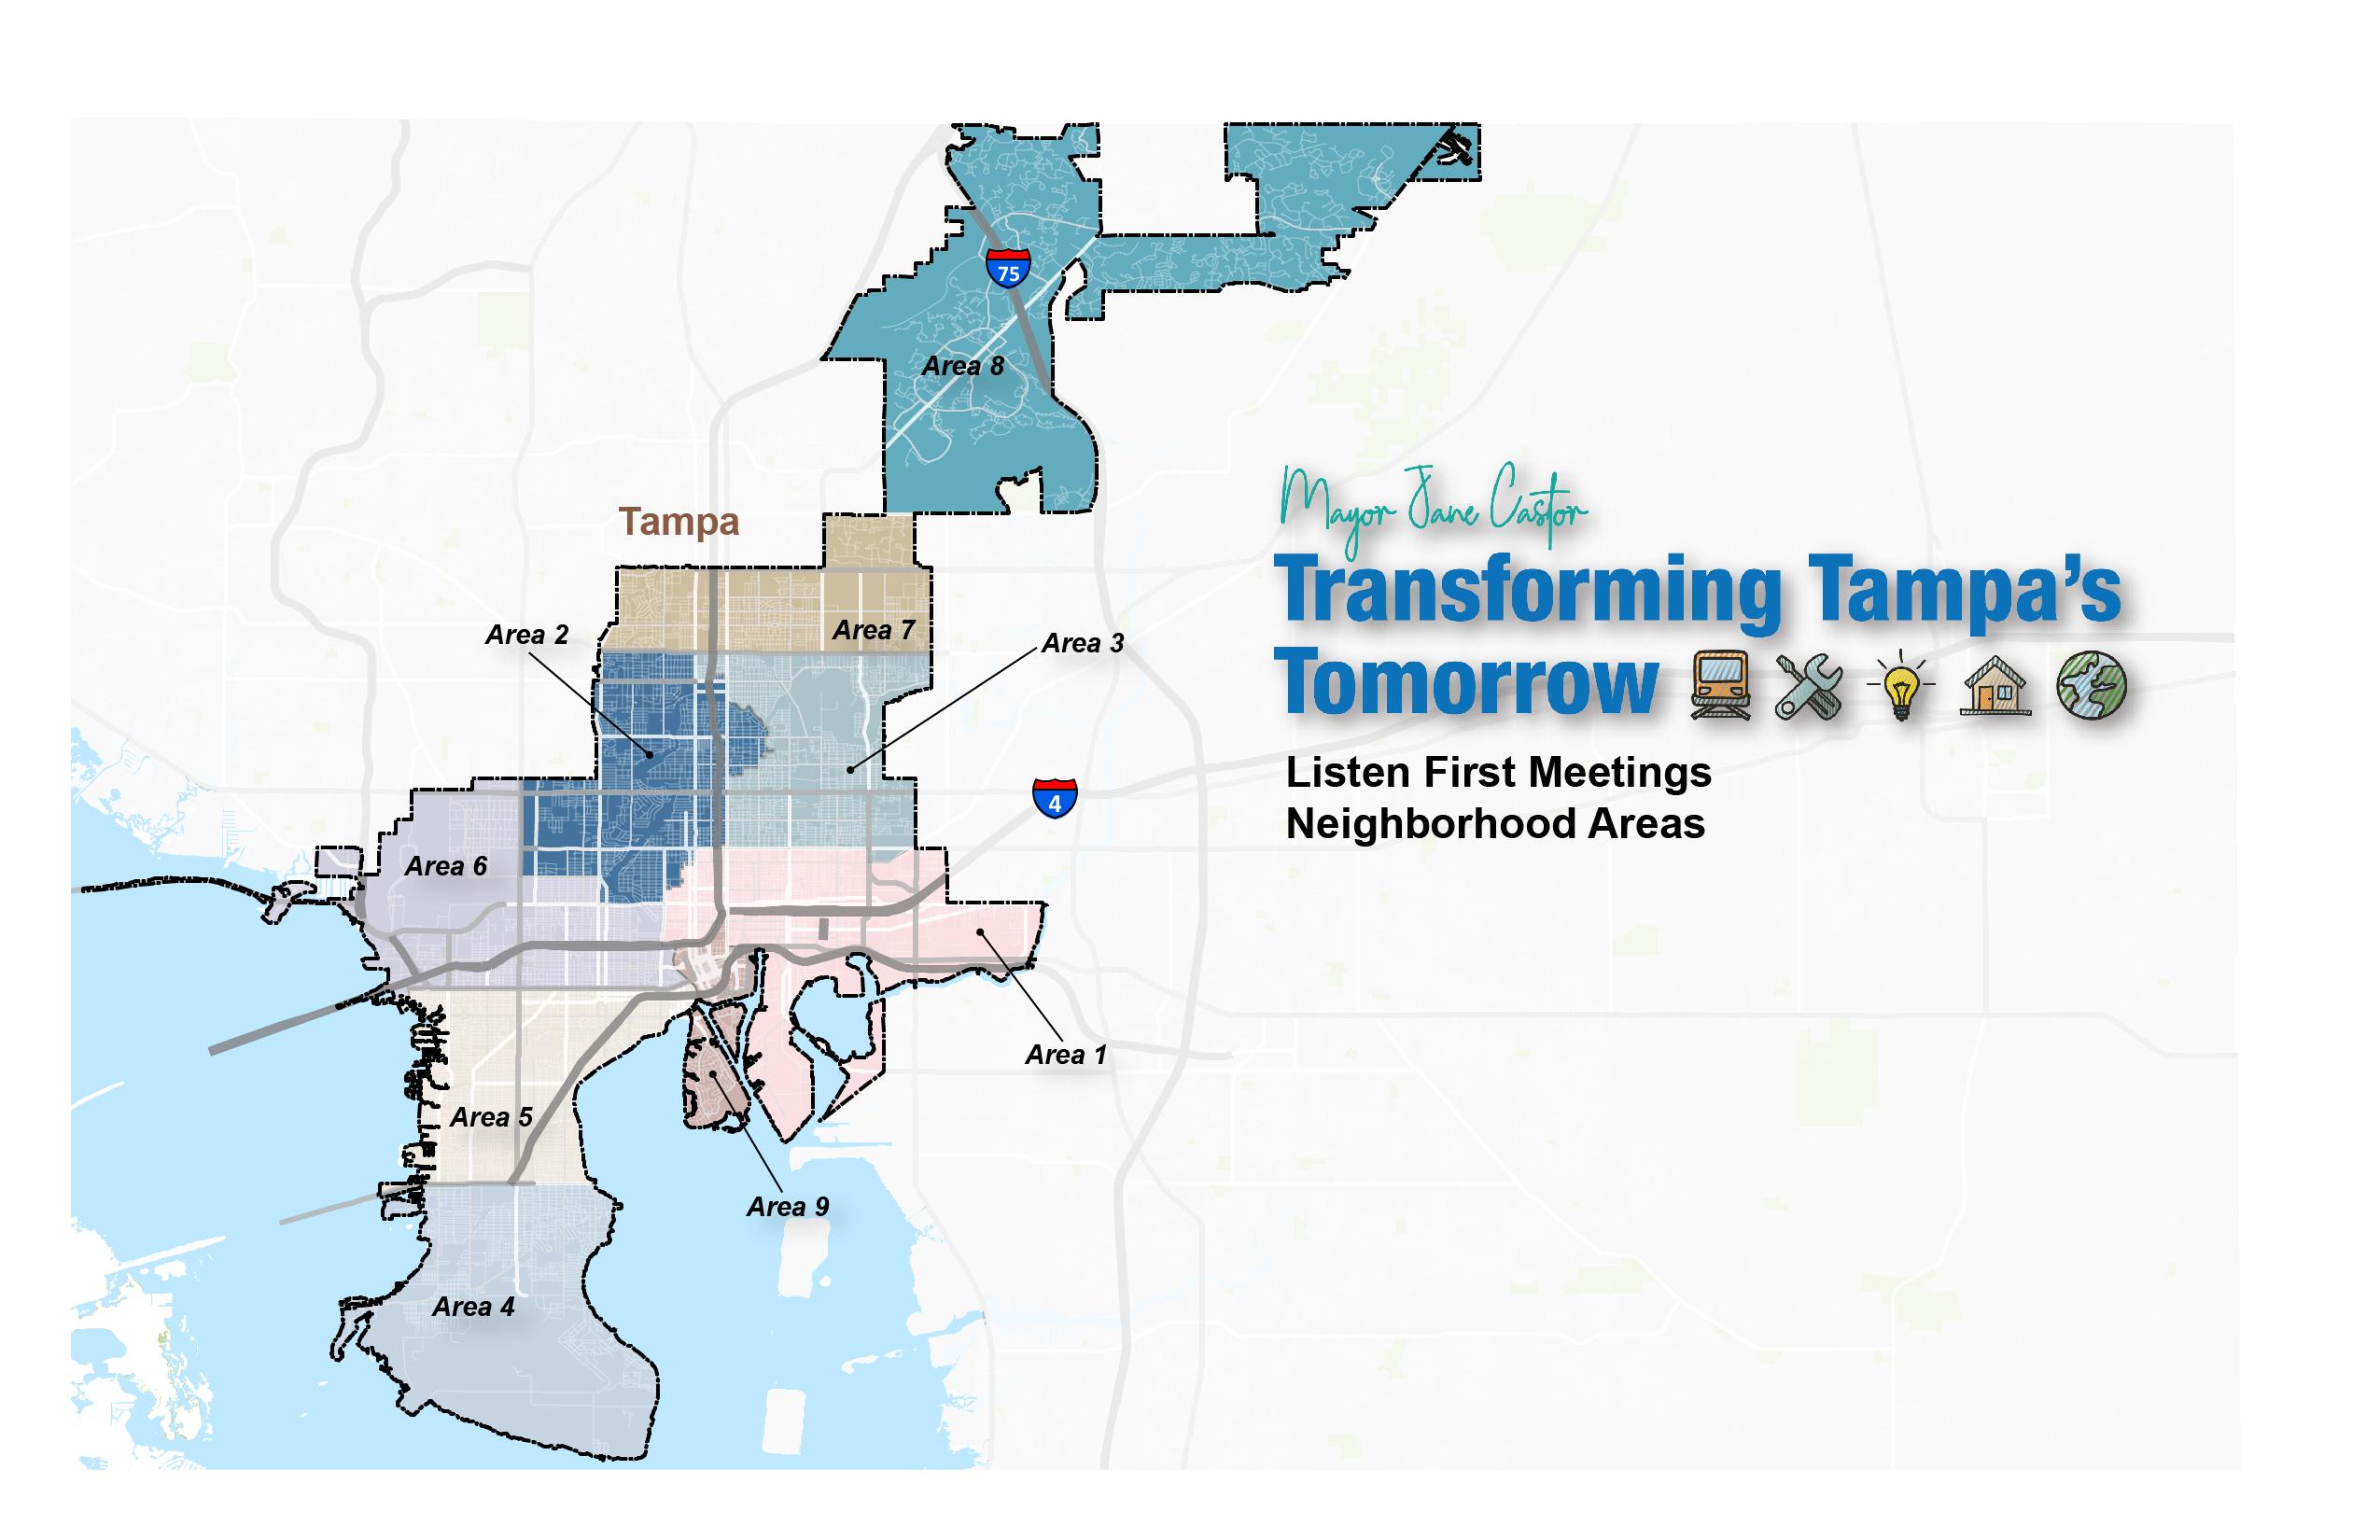 Listen First Meeting Map and Neighborhood Areas